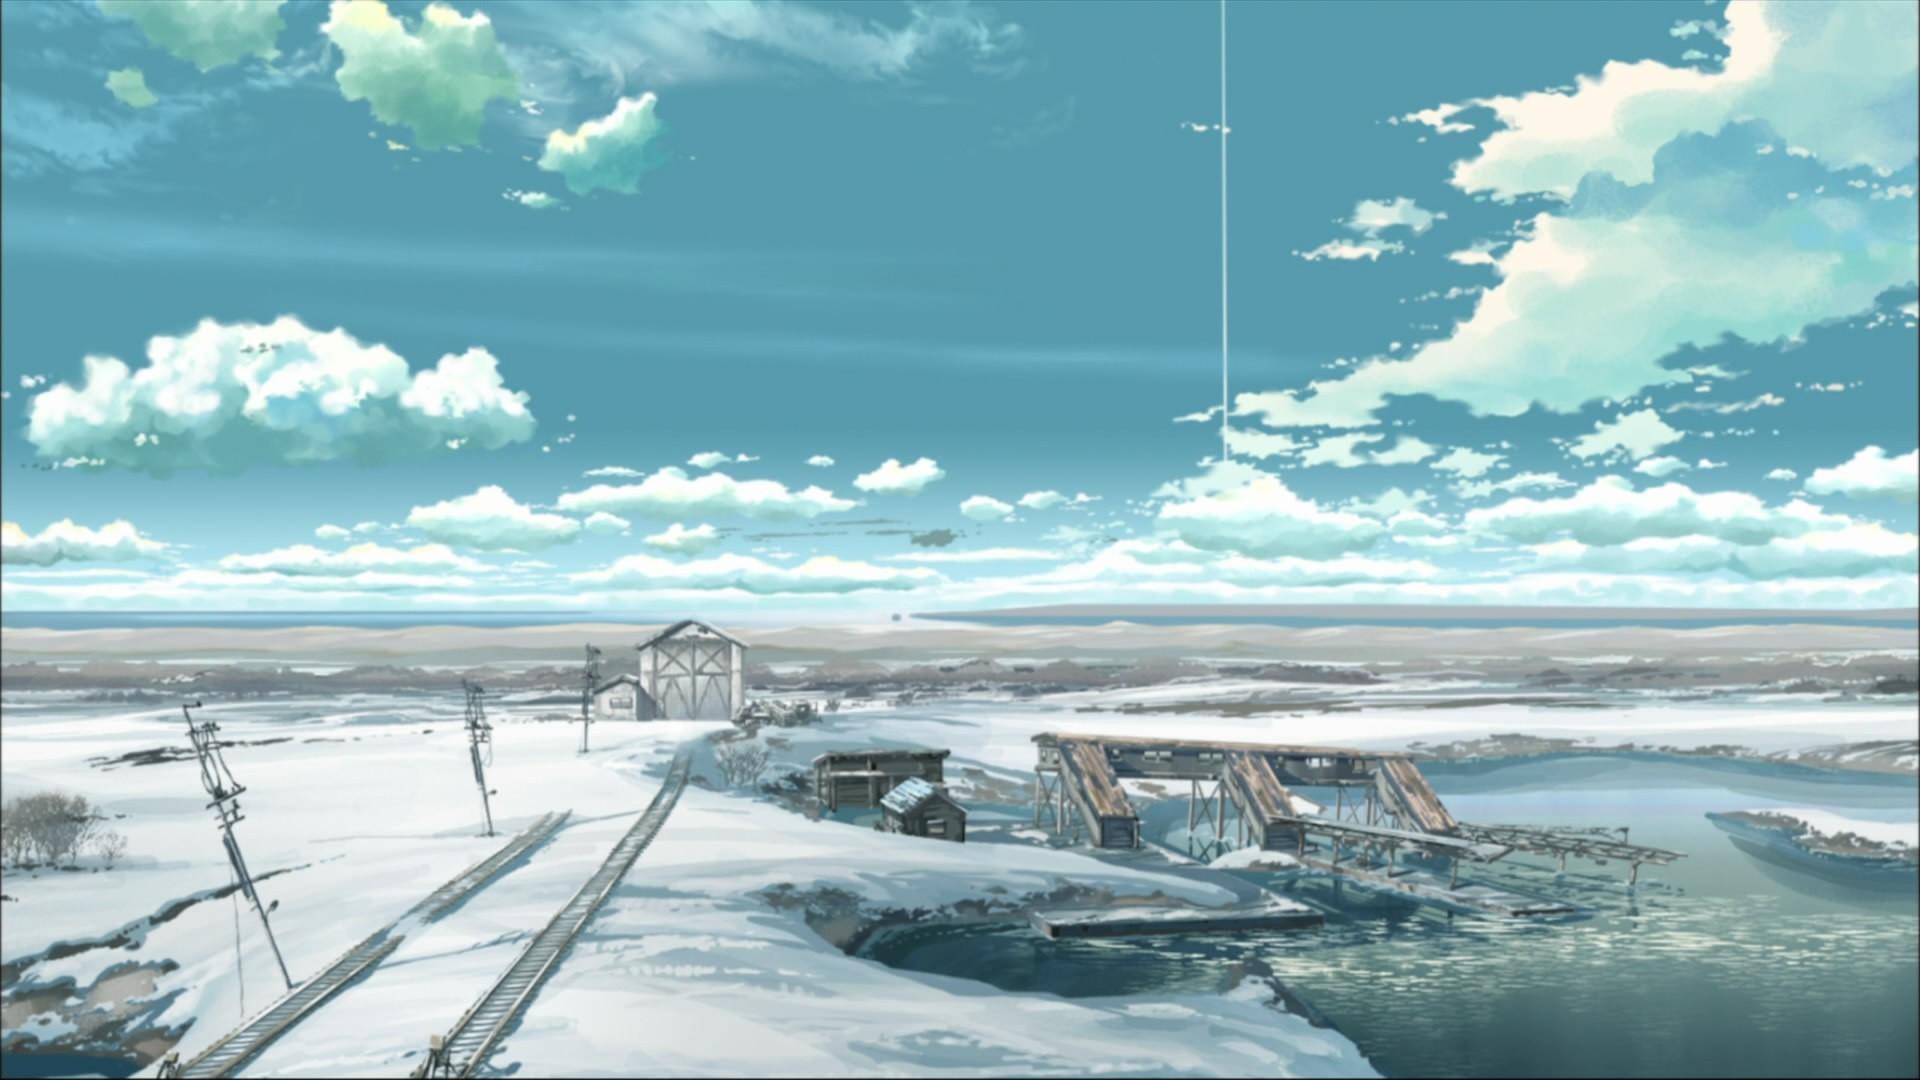 Girl With Basketball Wallpaper Anime Landscape Wallpaper Hd Pixelstalk Net